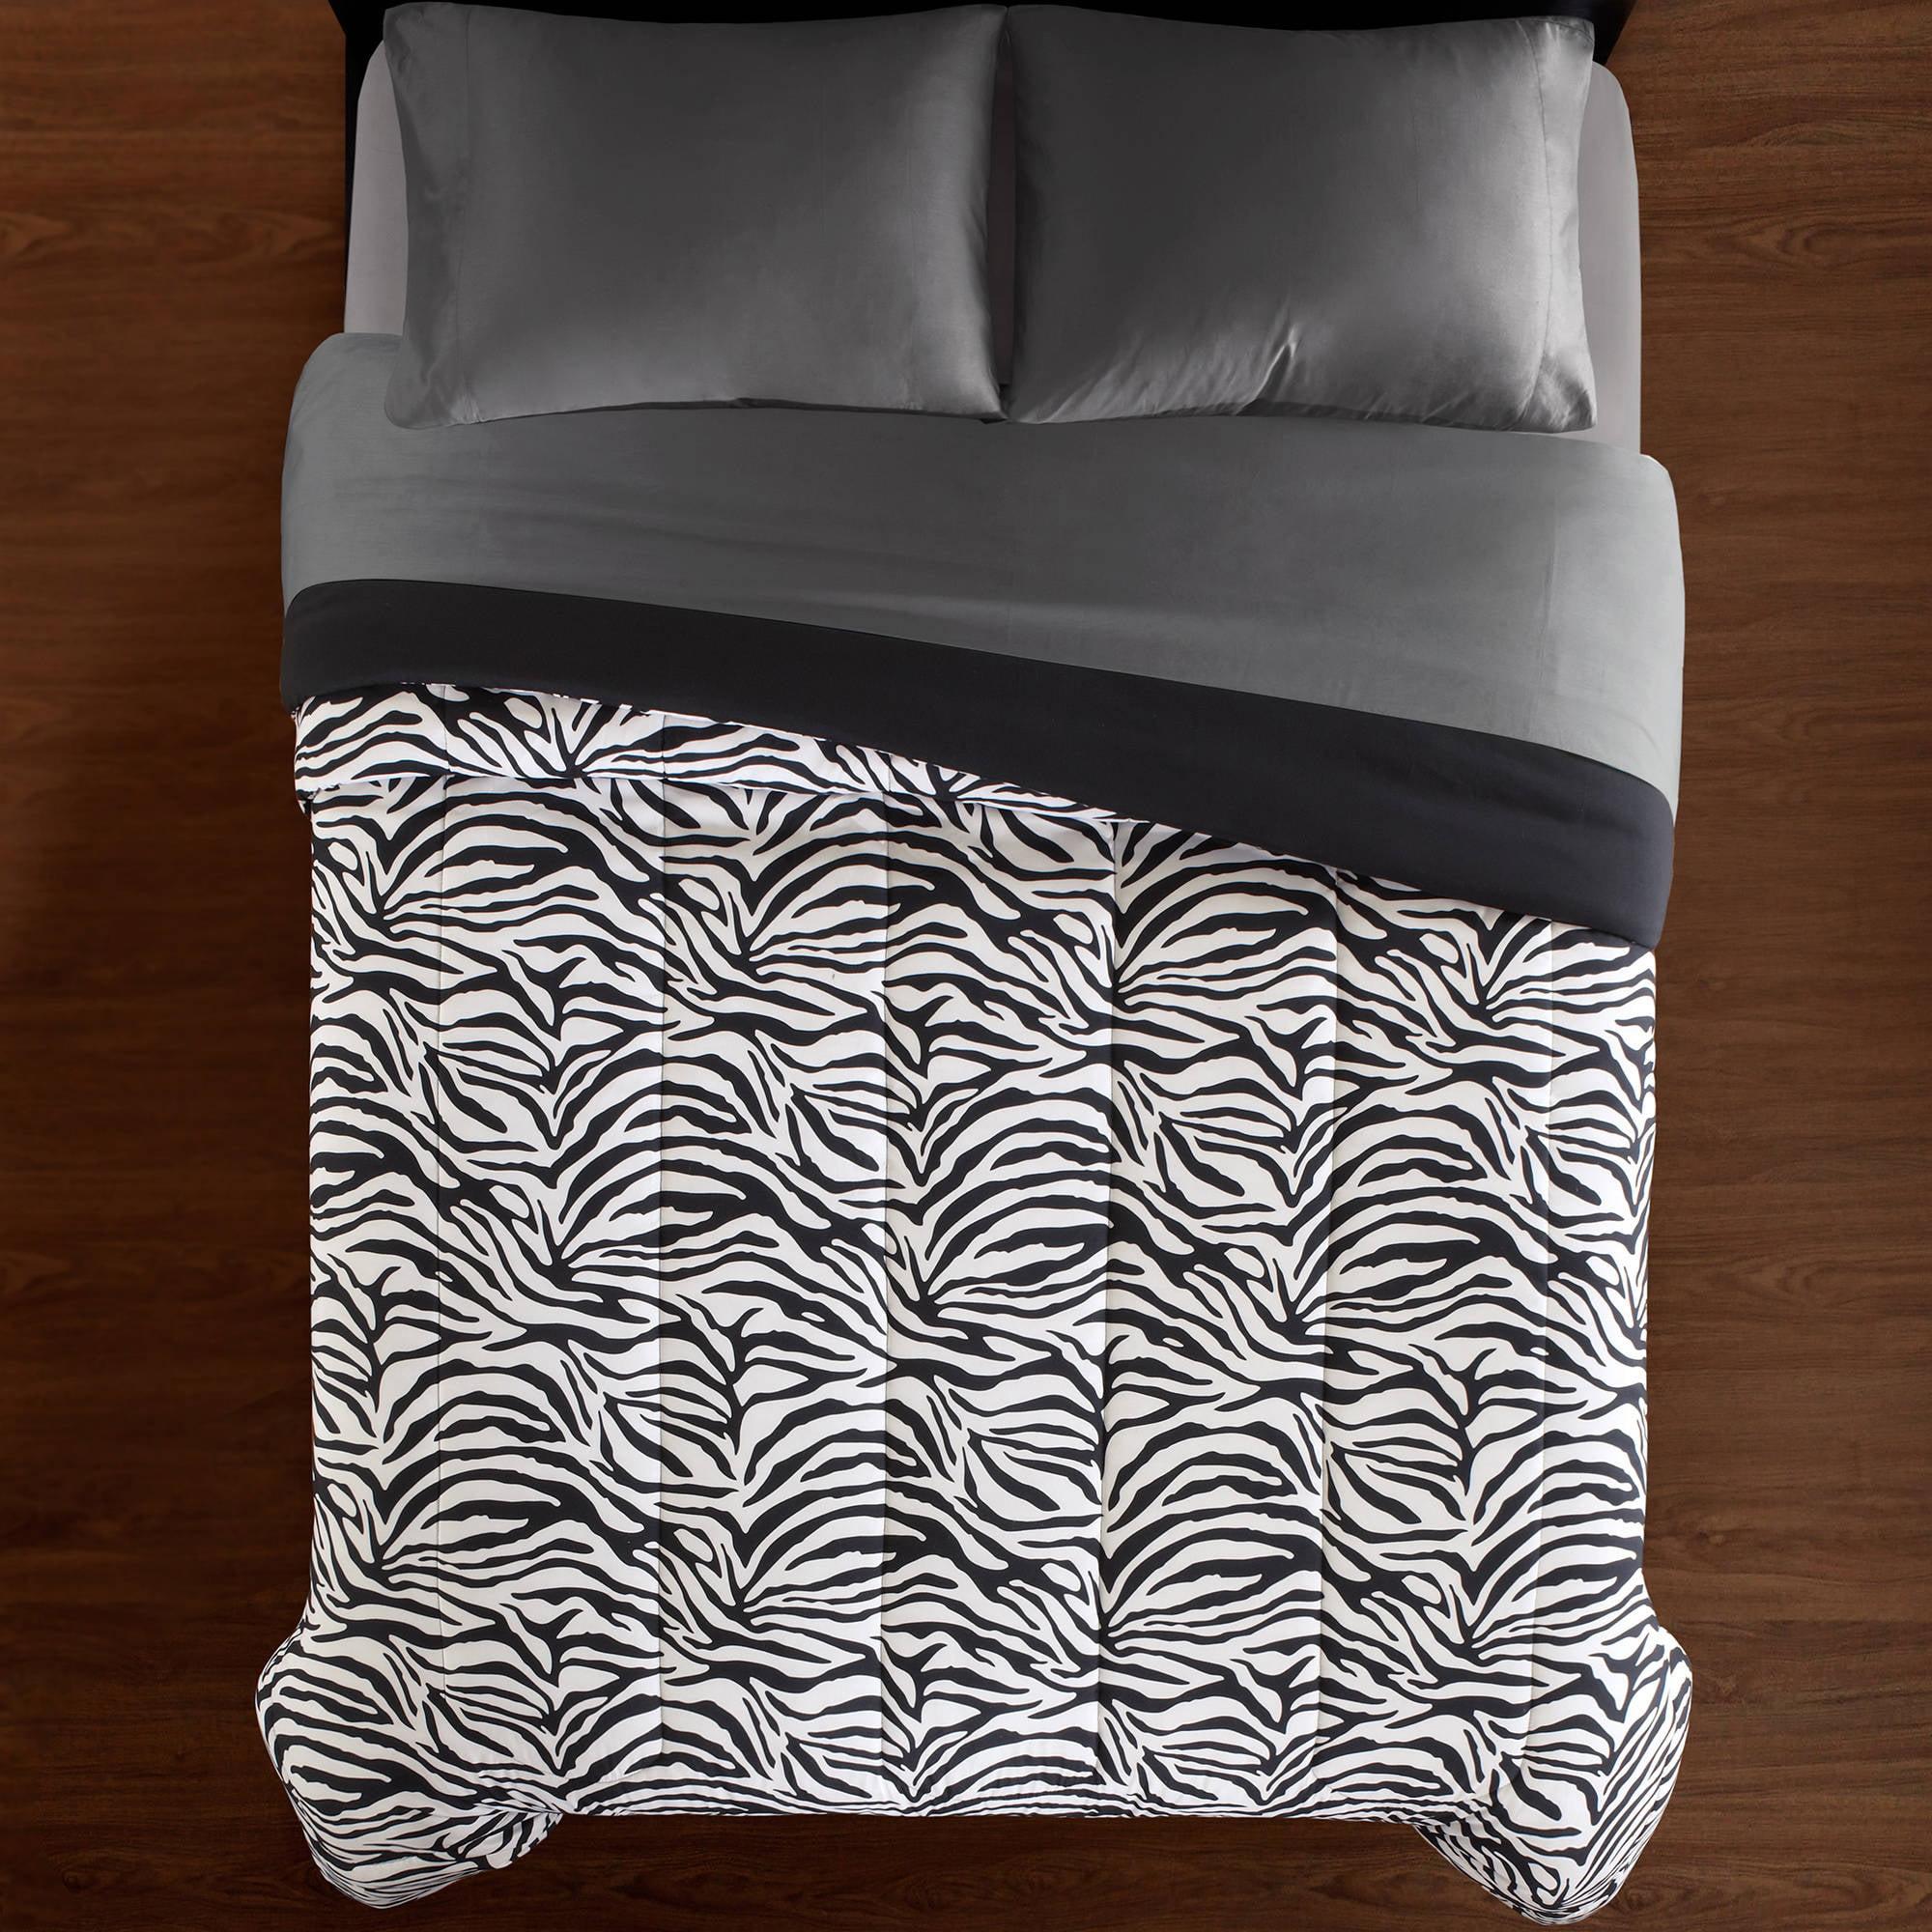 Mainstays Zebra Print Soft Microfiber Bedding Comforter